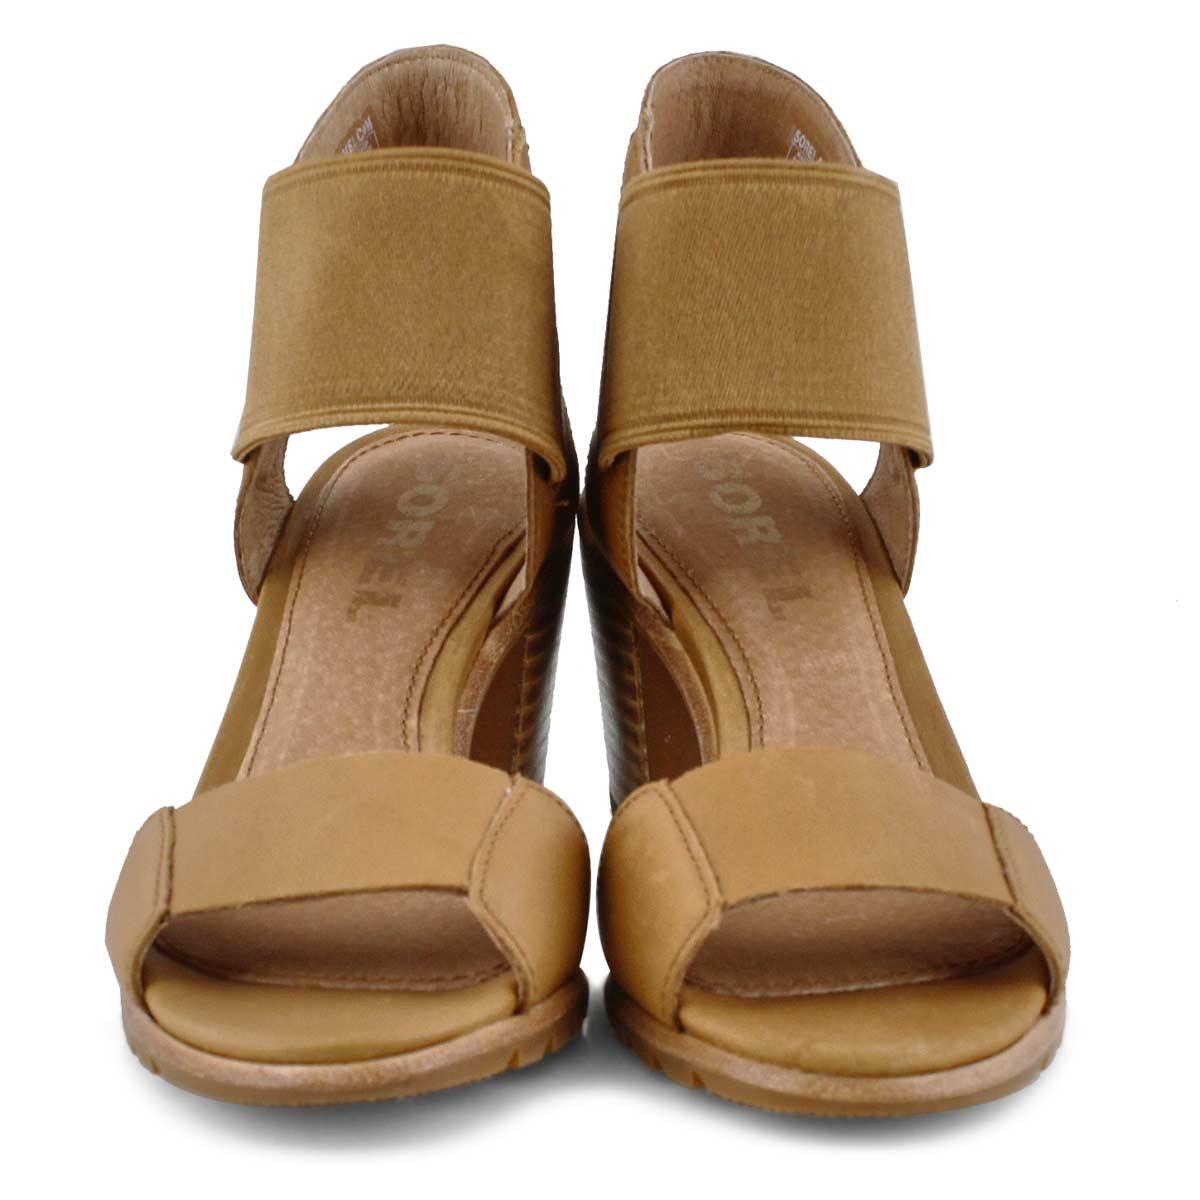 Women's Nadia Dress Sandal - Camel Brown